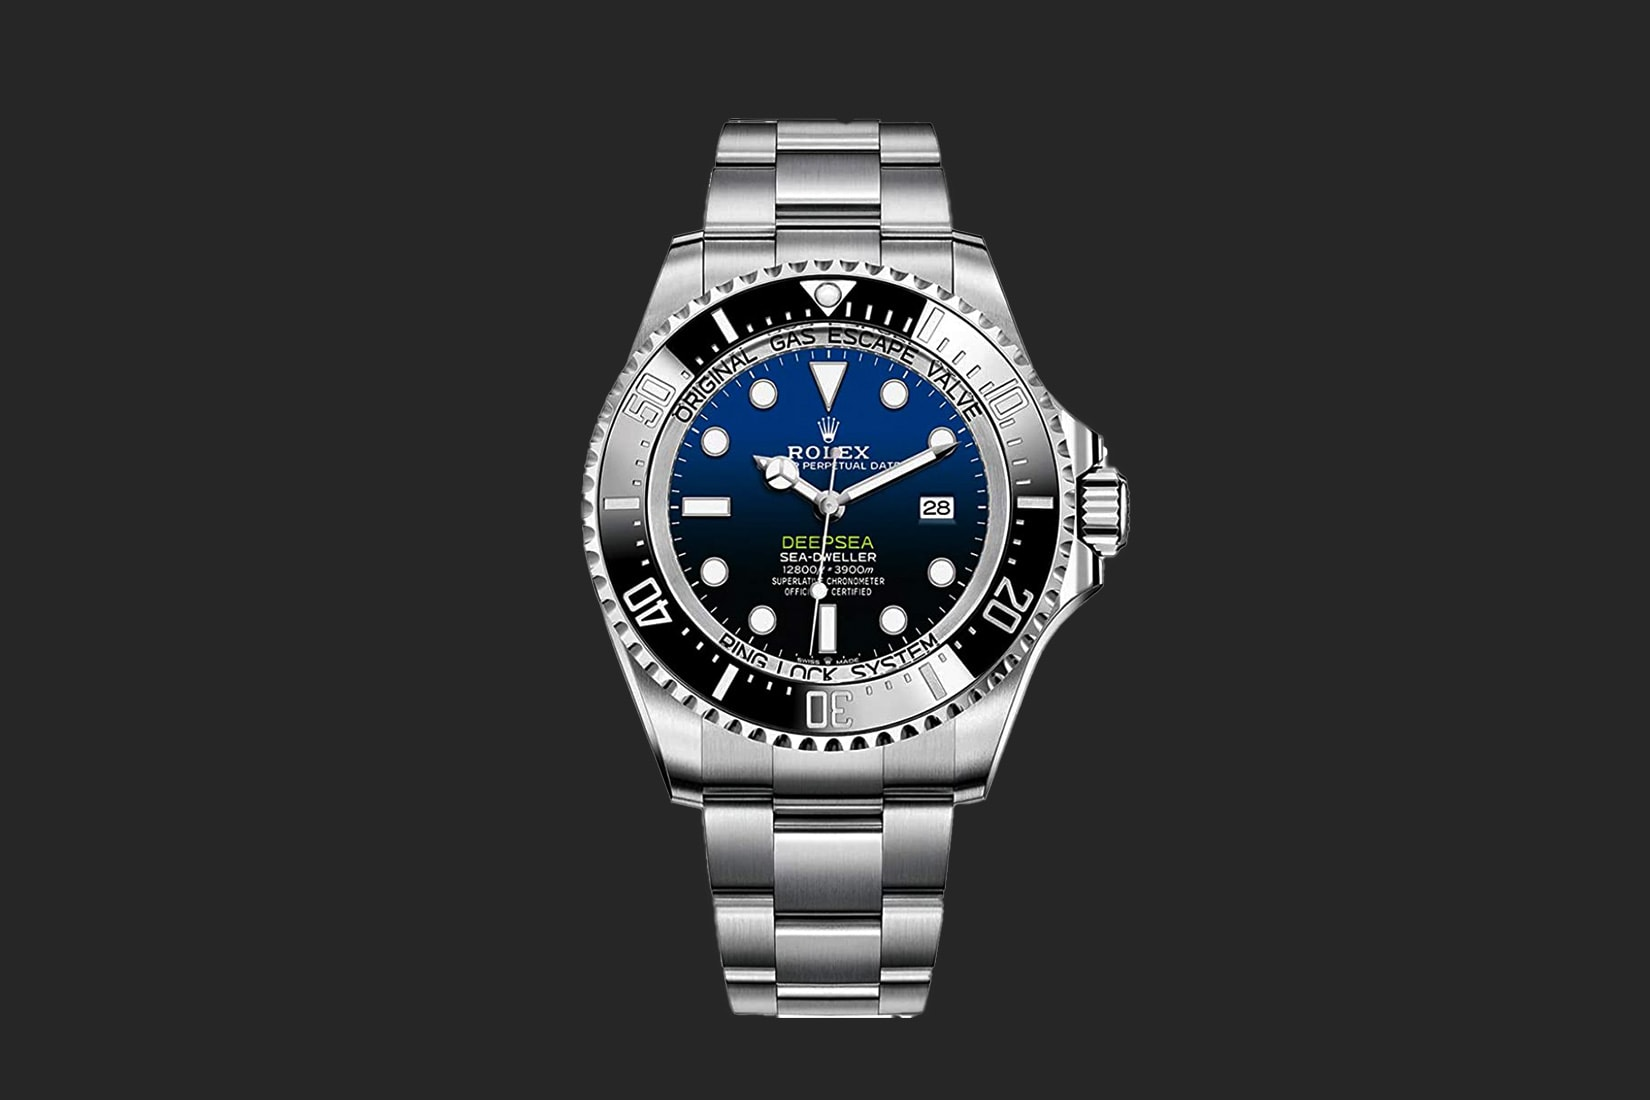 best dive watch rolex sea dweller deepsea review - Luxe Digital